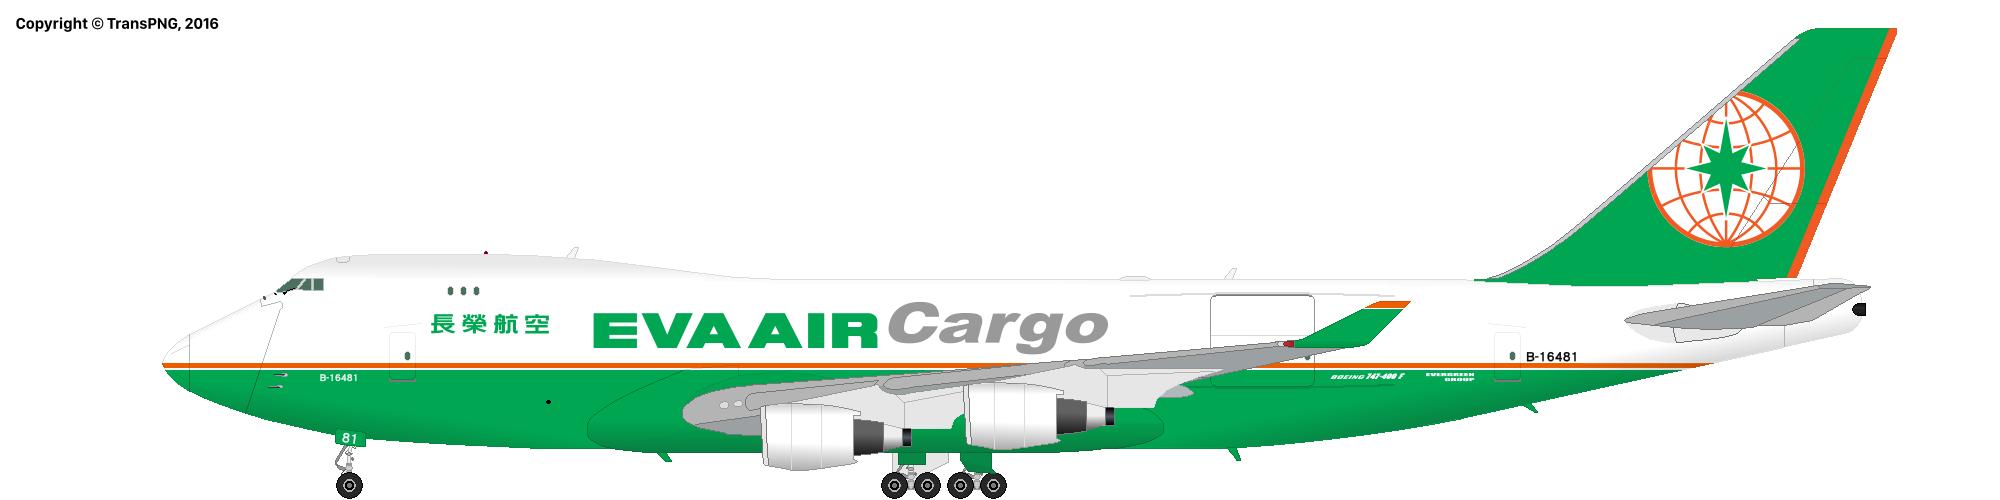 Airplane 6203